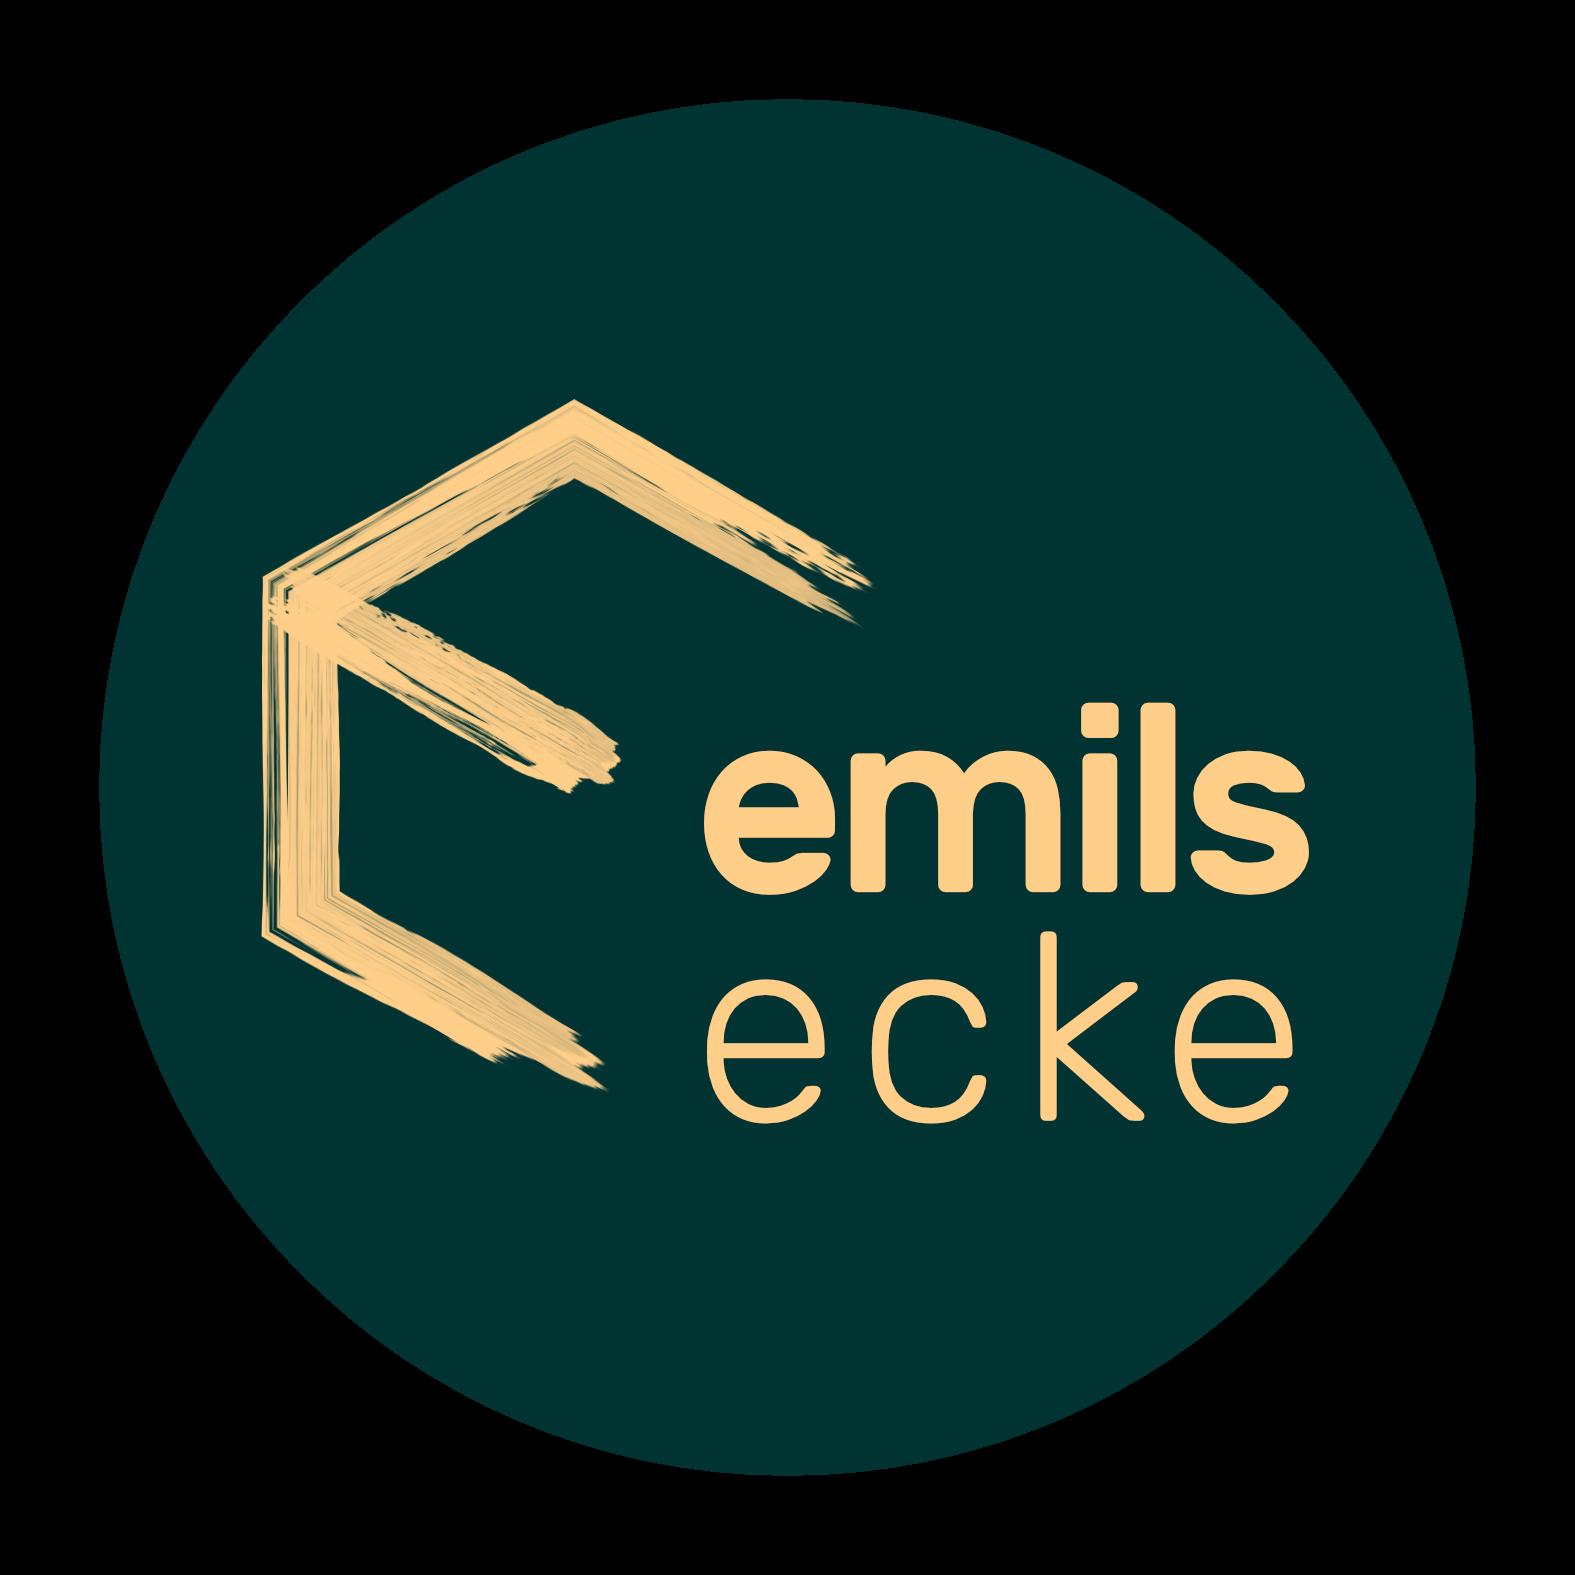 Emils Ecke